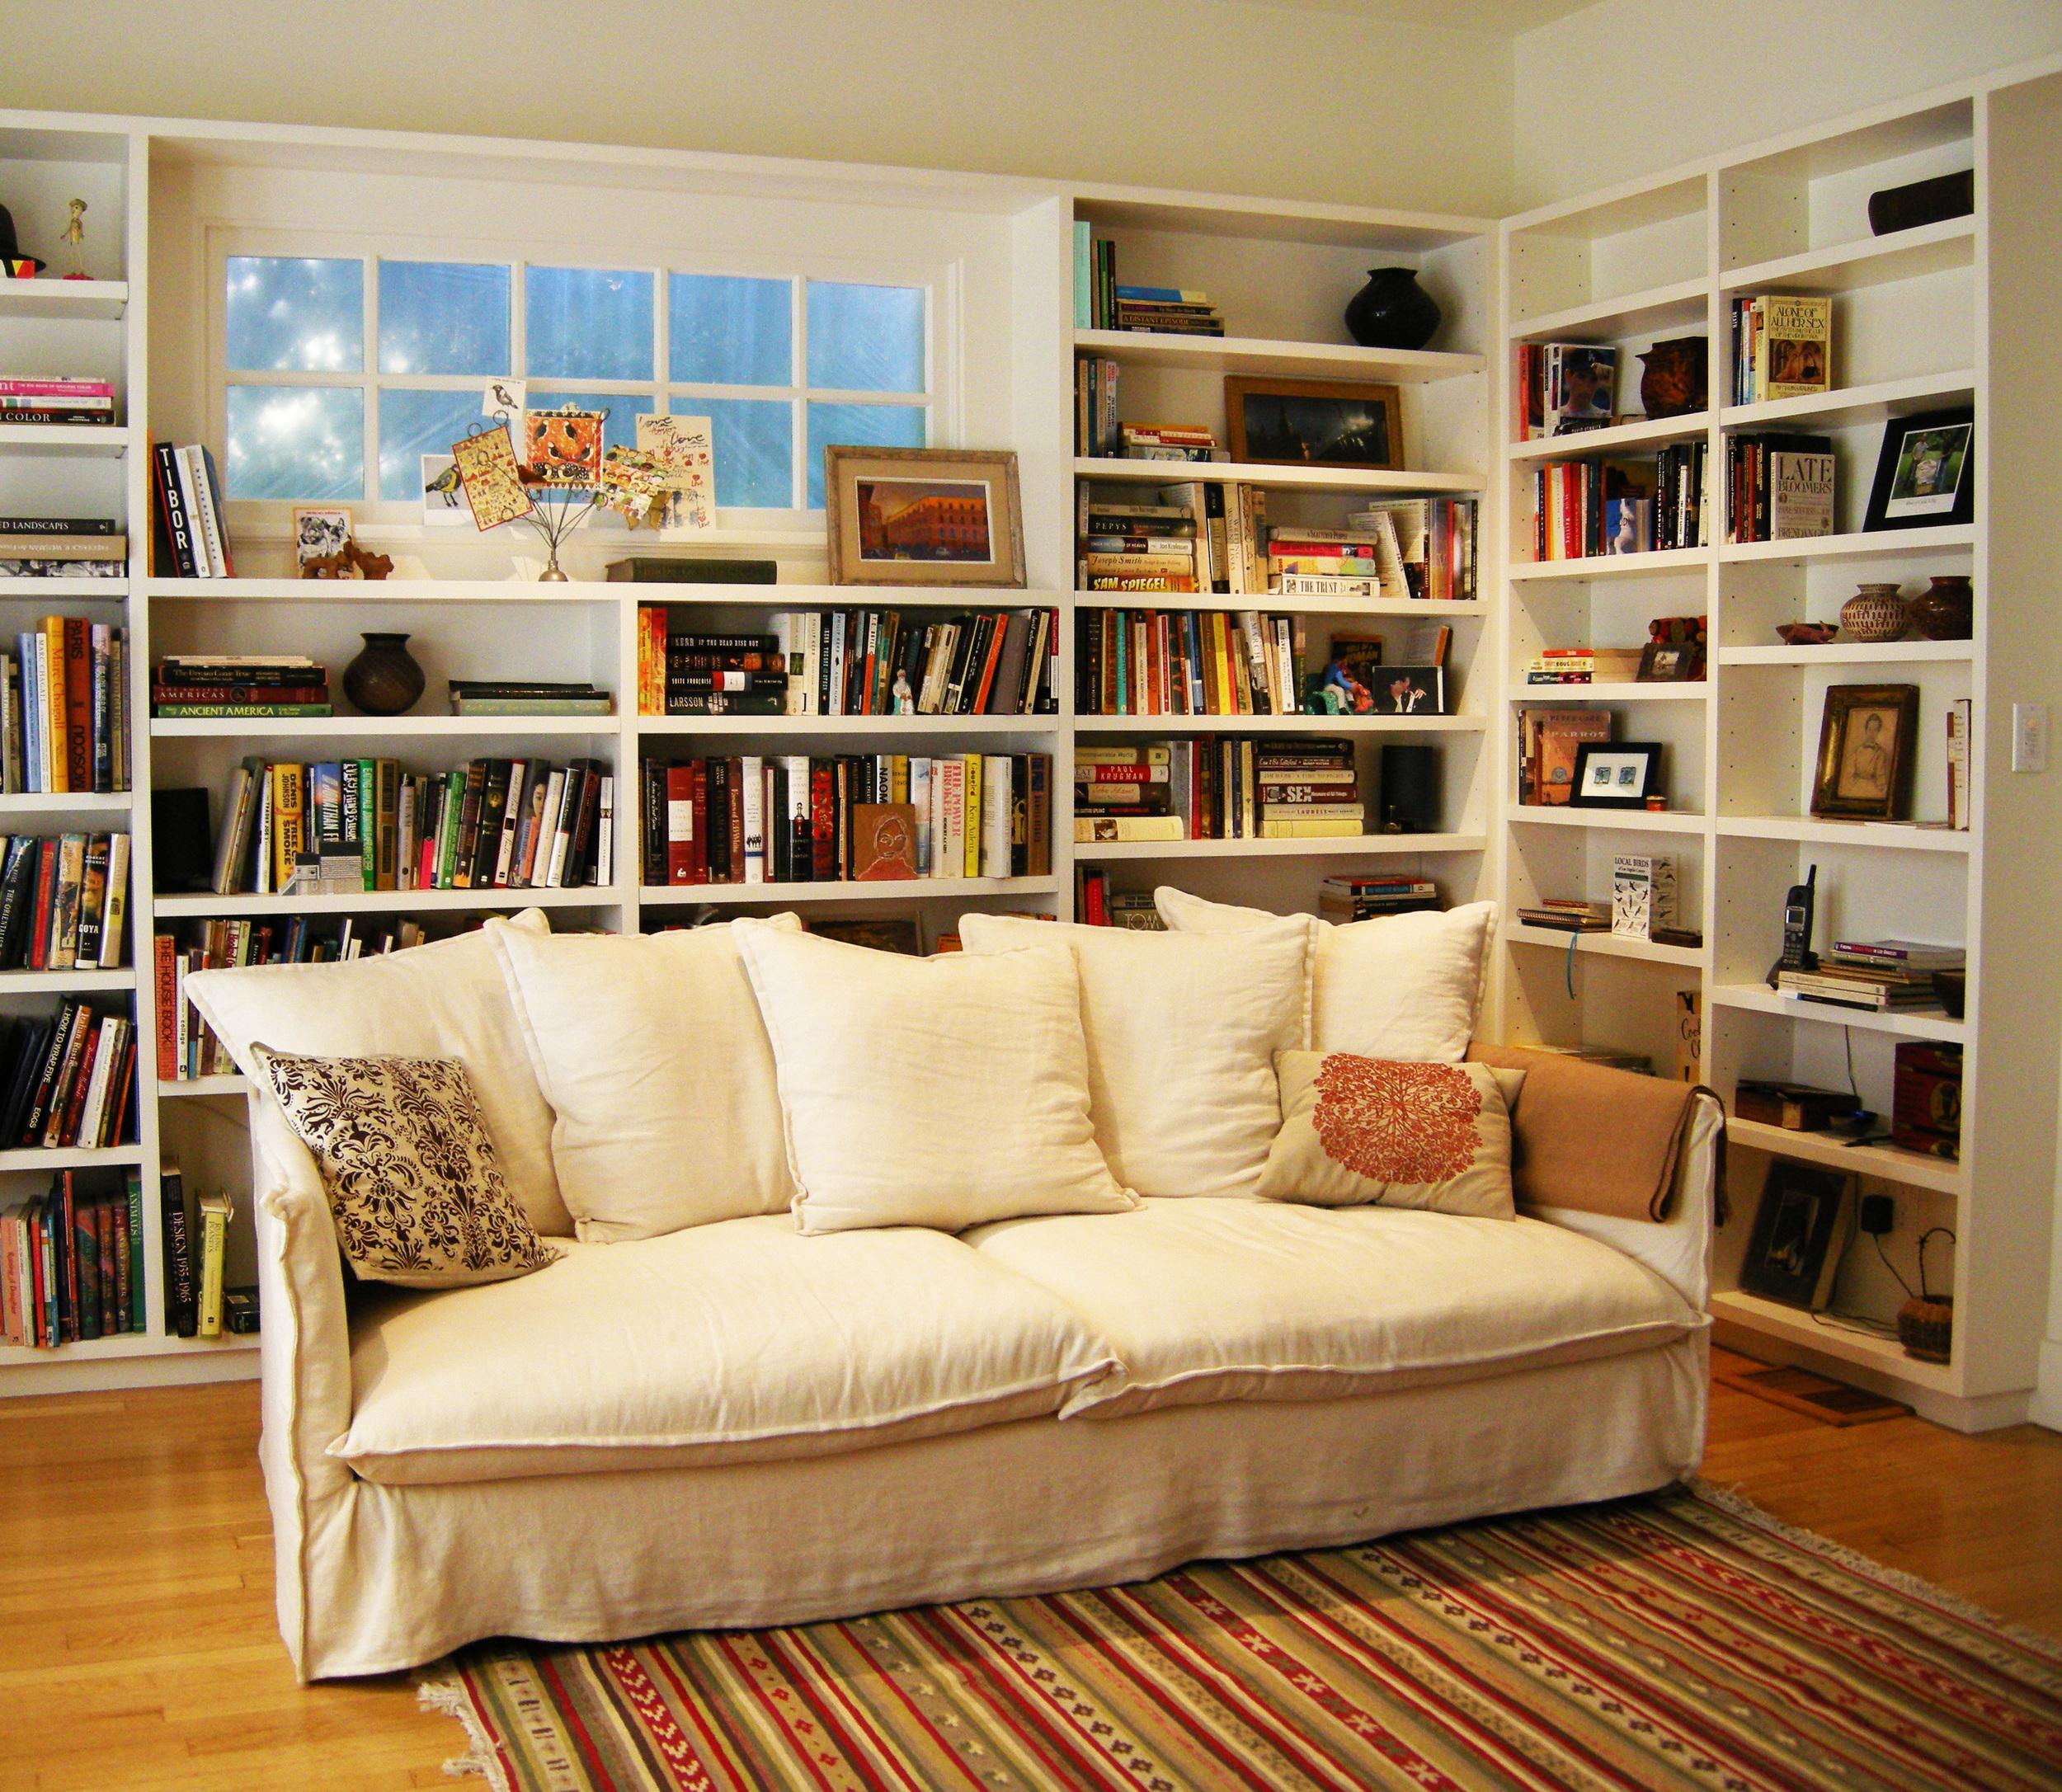 1a. LA library photos 4.28.11 008 cropped.jpg